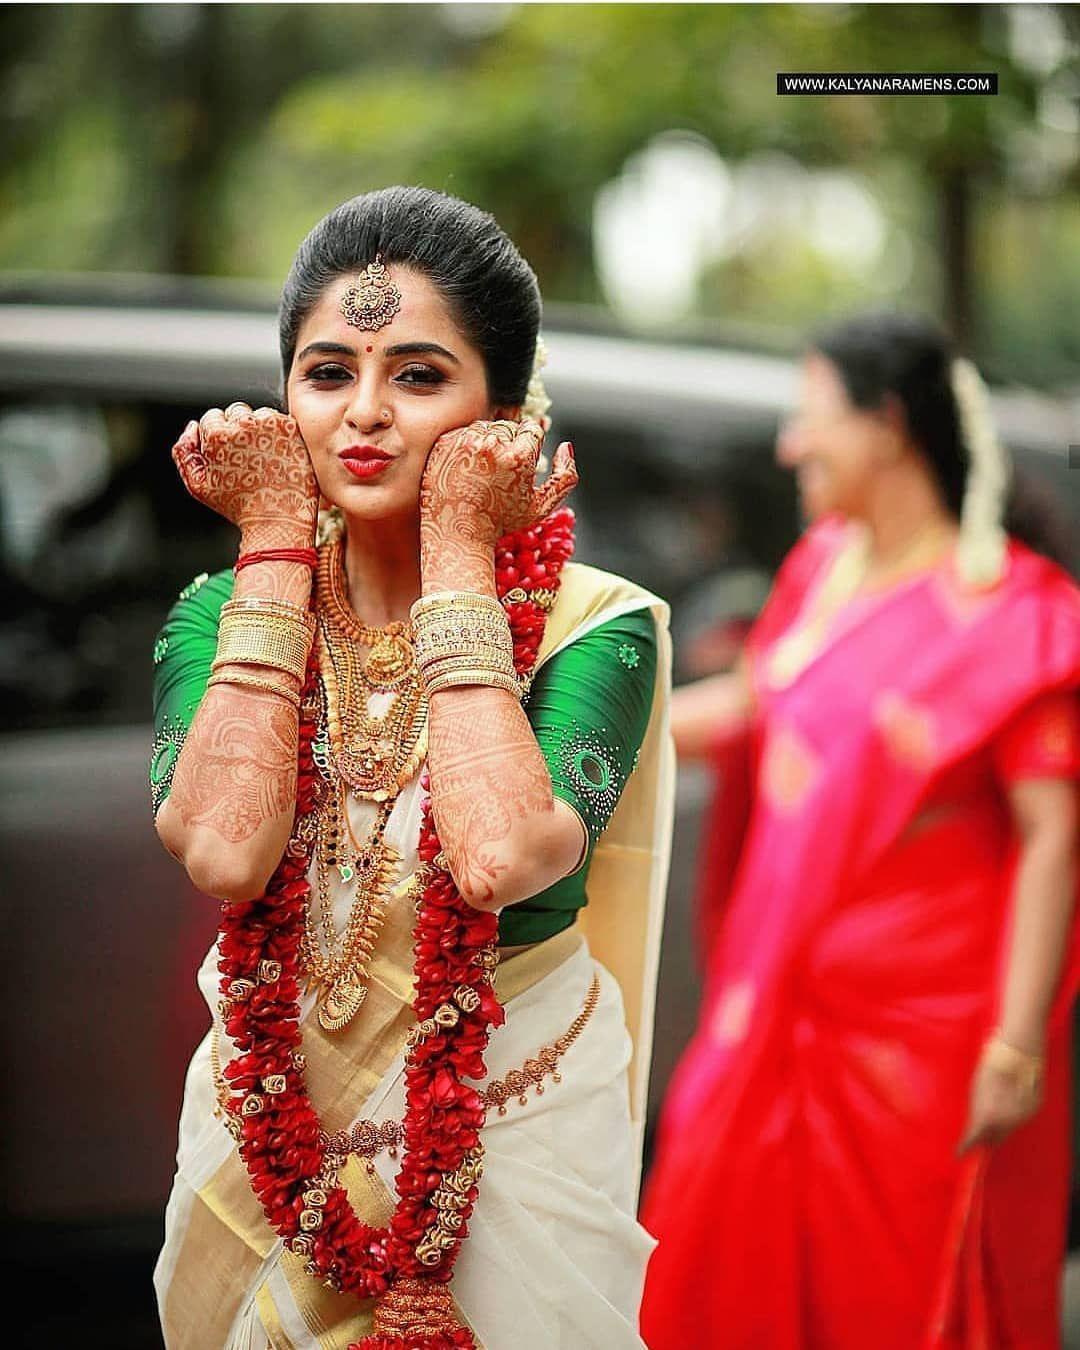 Wedding Photo Shoot Indian Wedding Photography Poses Bride Photoshoot Wedding Saree Indian